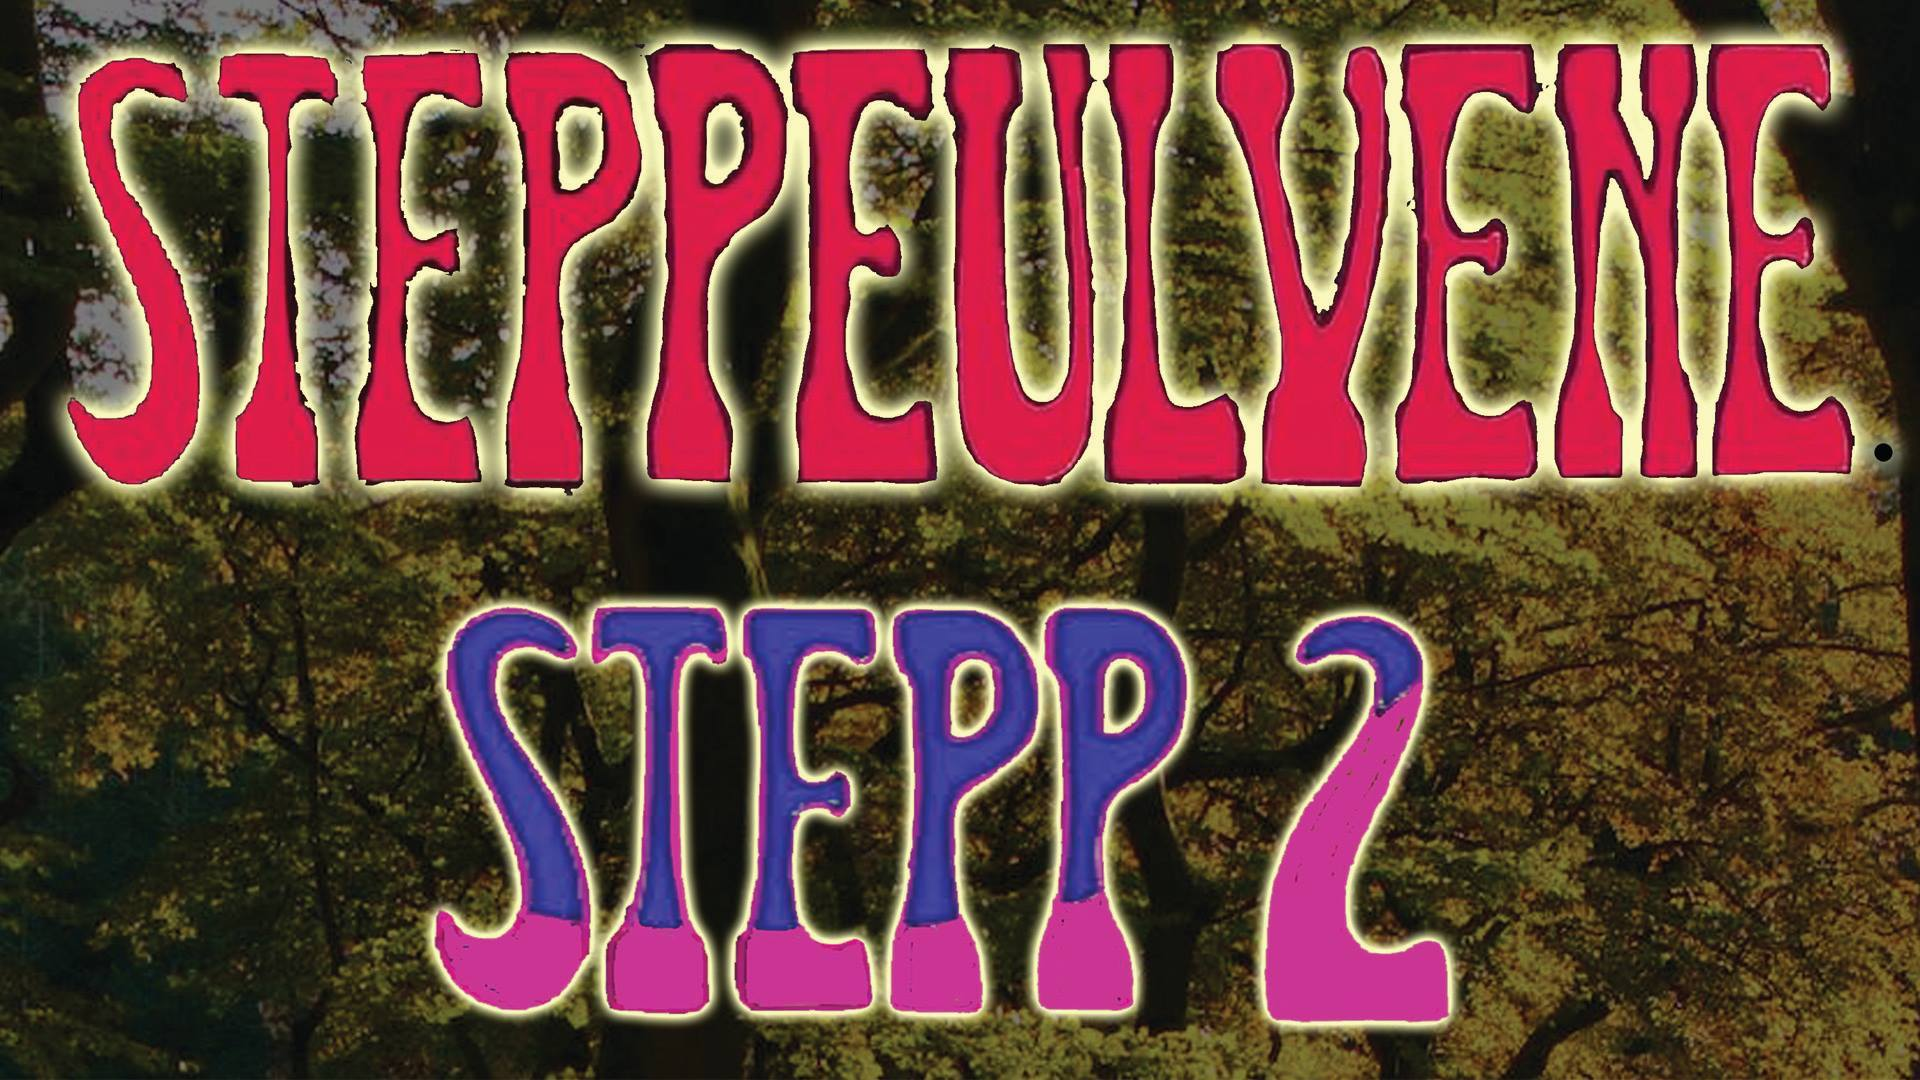 Harders - Stepp 2